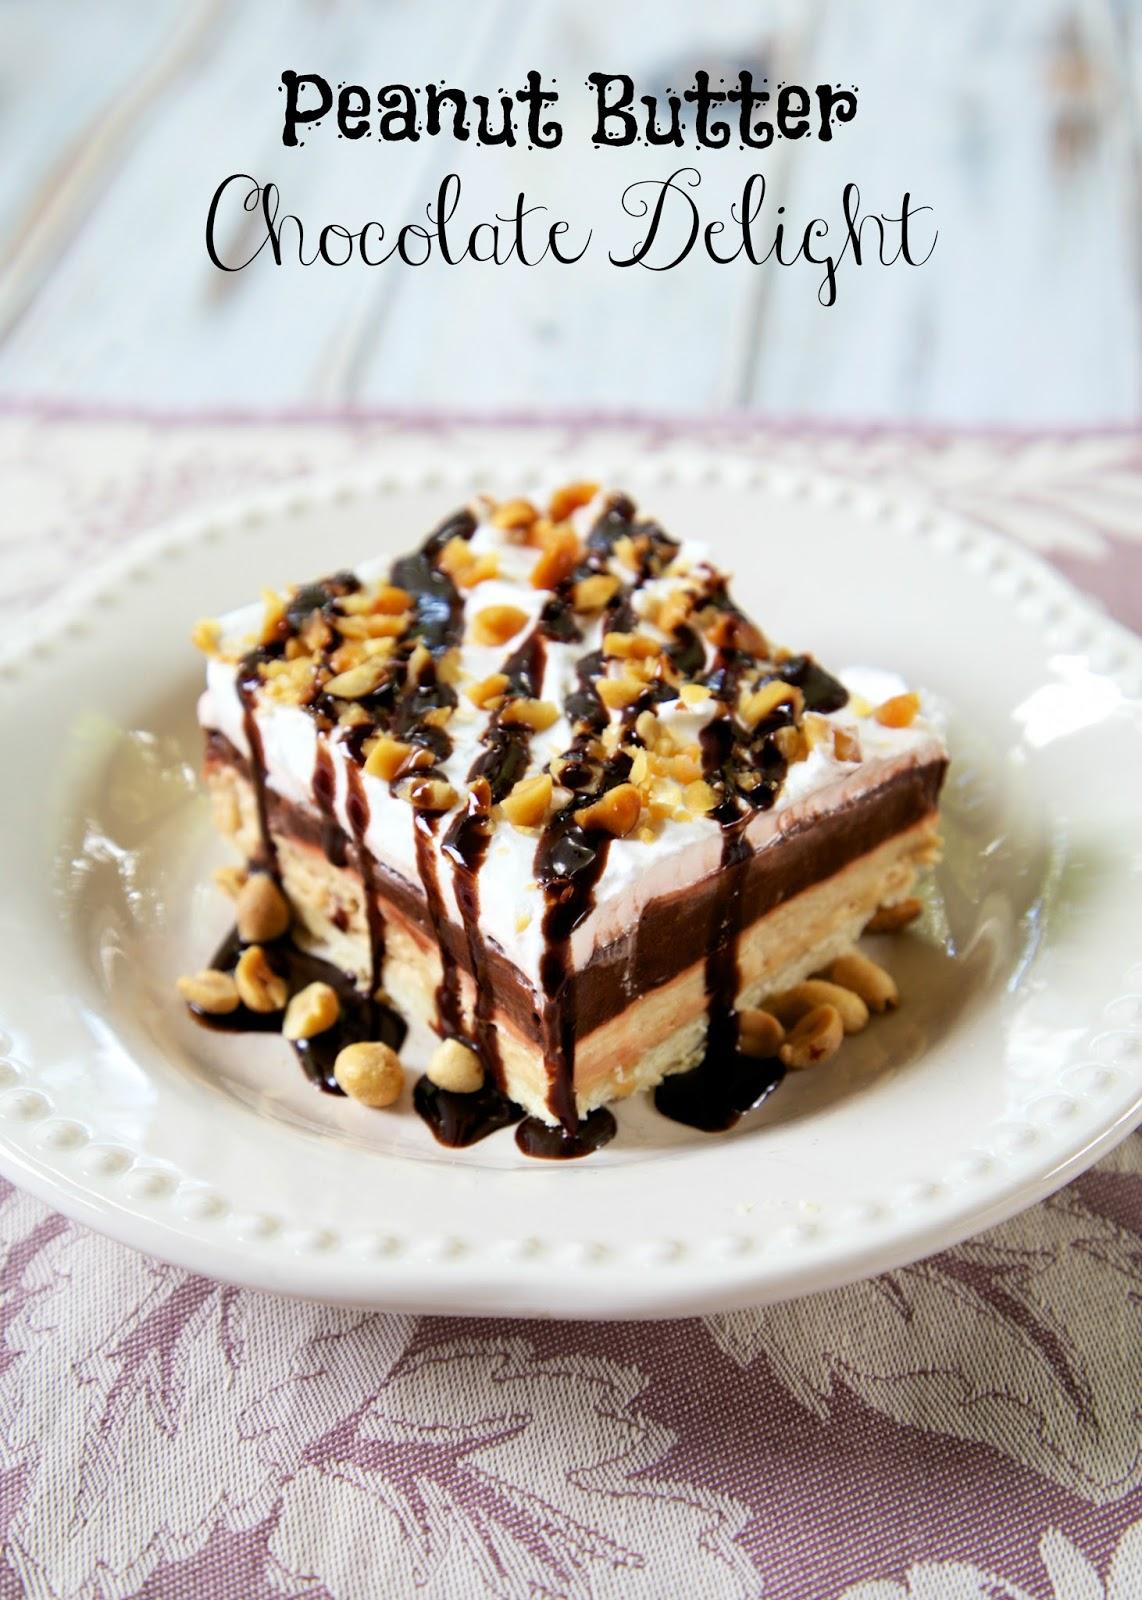 peanut butter chocolate delight dessert